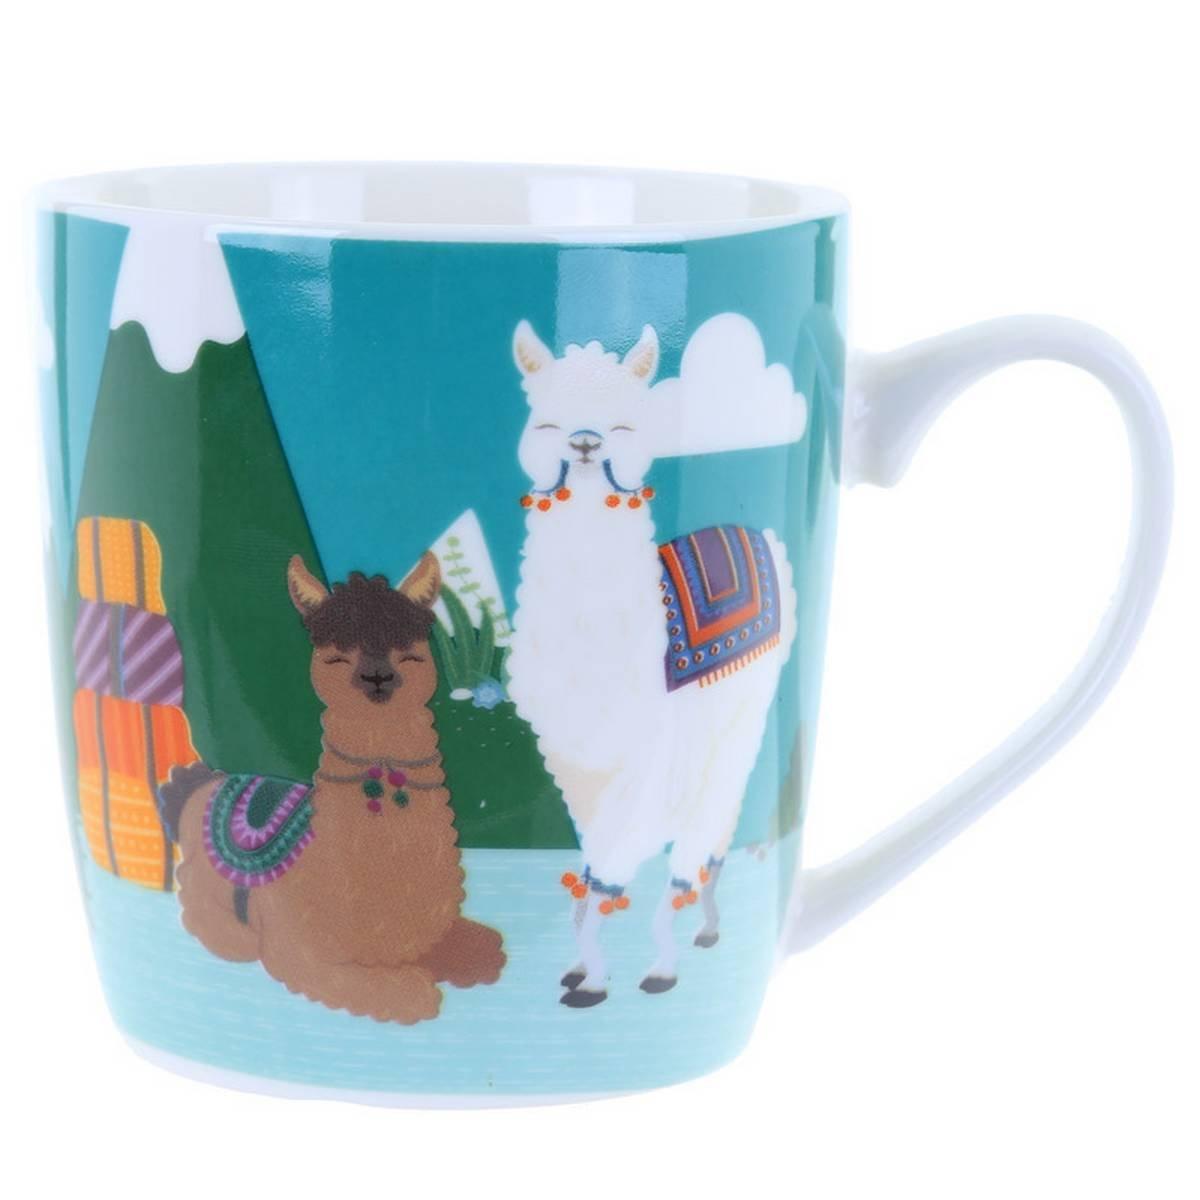 Alpaca Design-MUG255 Fun Animal New Bone China Mug